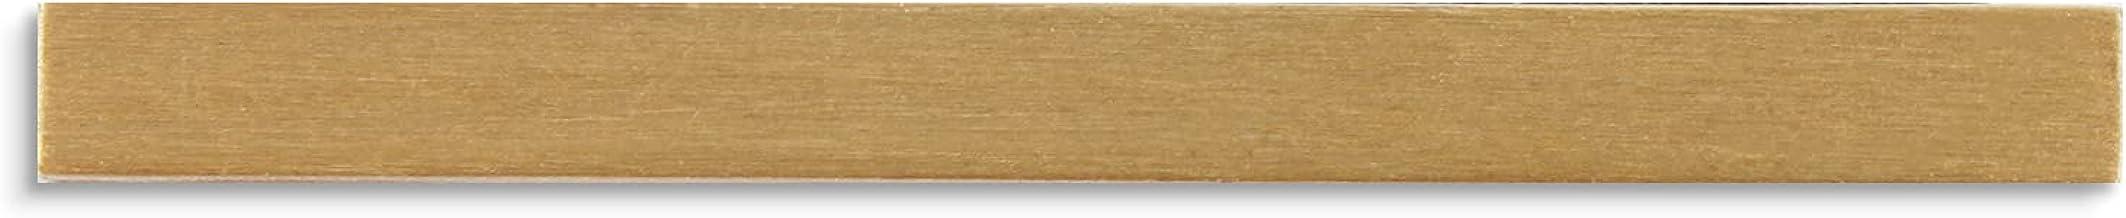 Larcele 1.29inch/33mm Self-Stick Koper Modern Huisnummer Adres Nummers Mailbox Nummer MPH-05 (Gouden Dash)